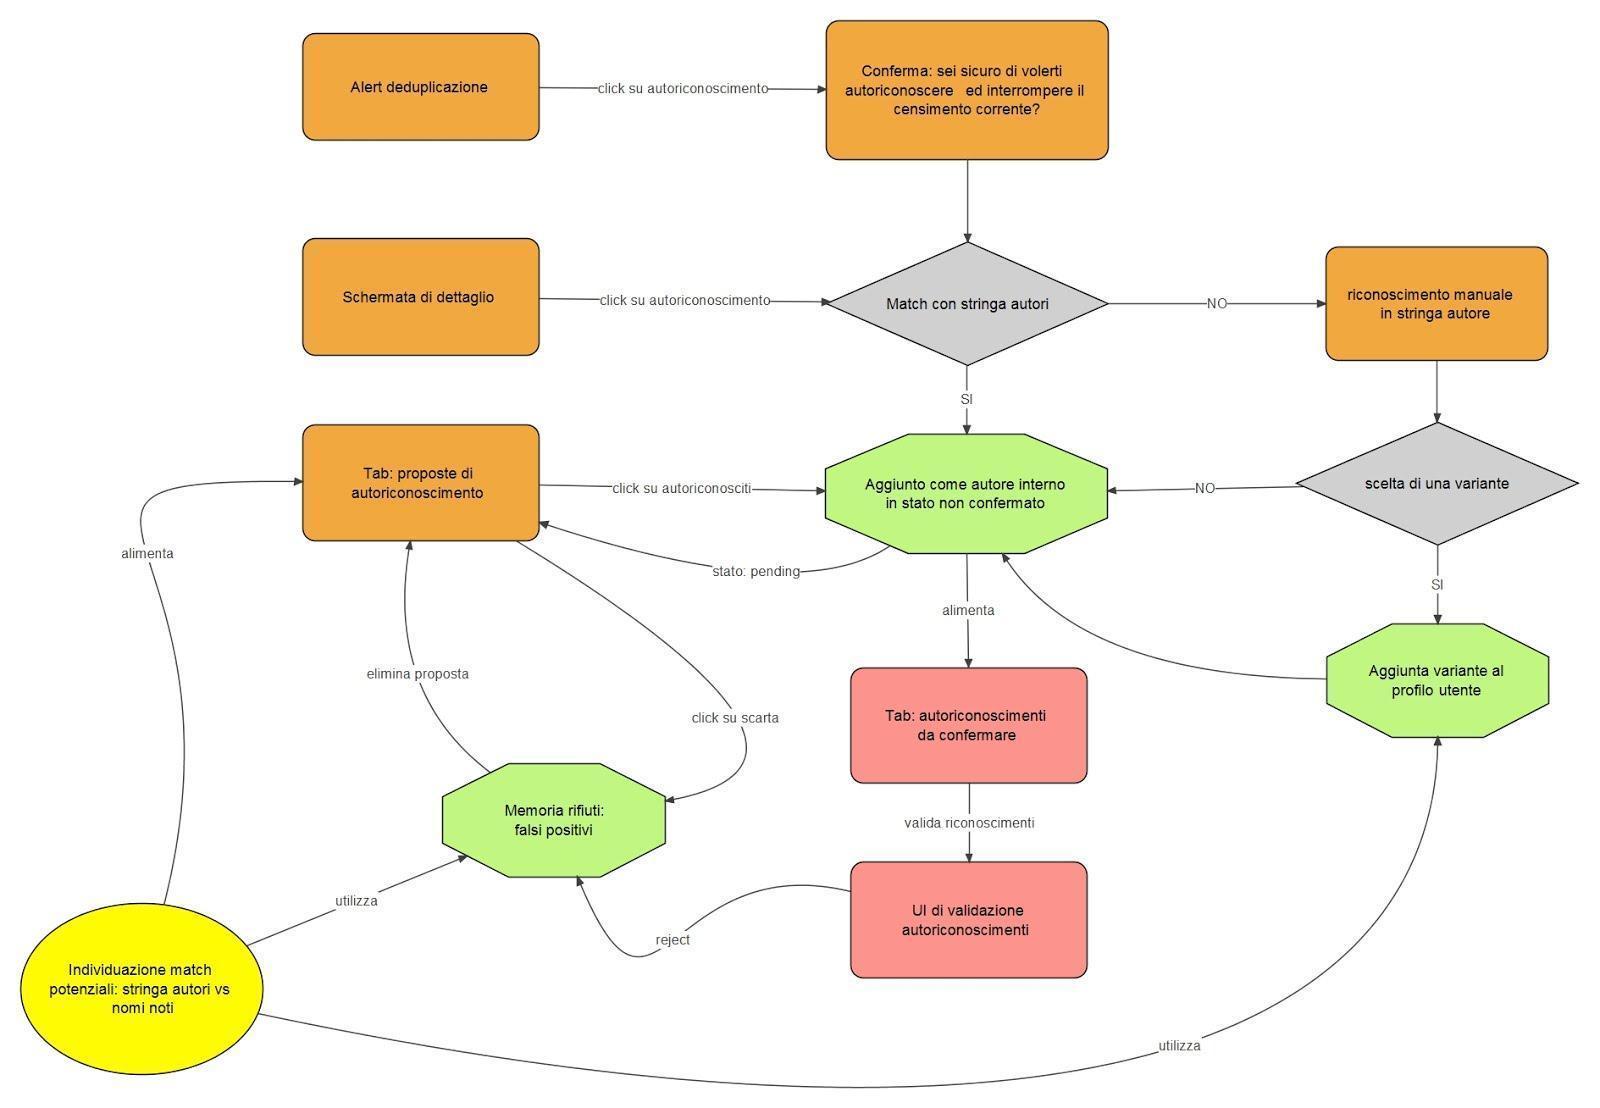 mappa-autoriconoscimento-copy.jpeg